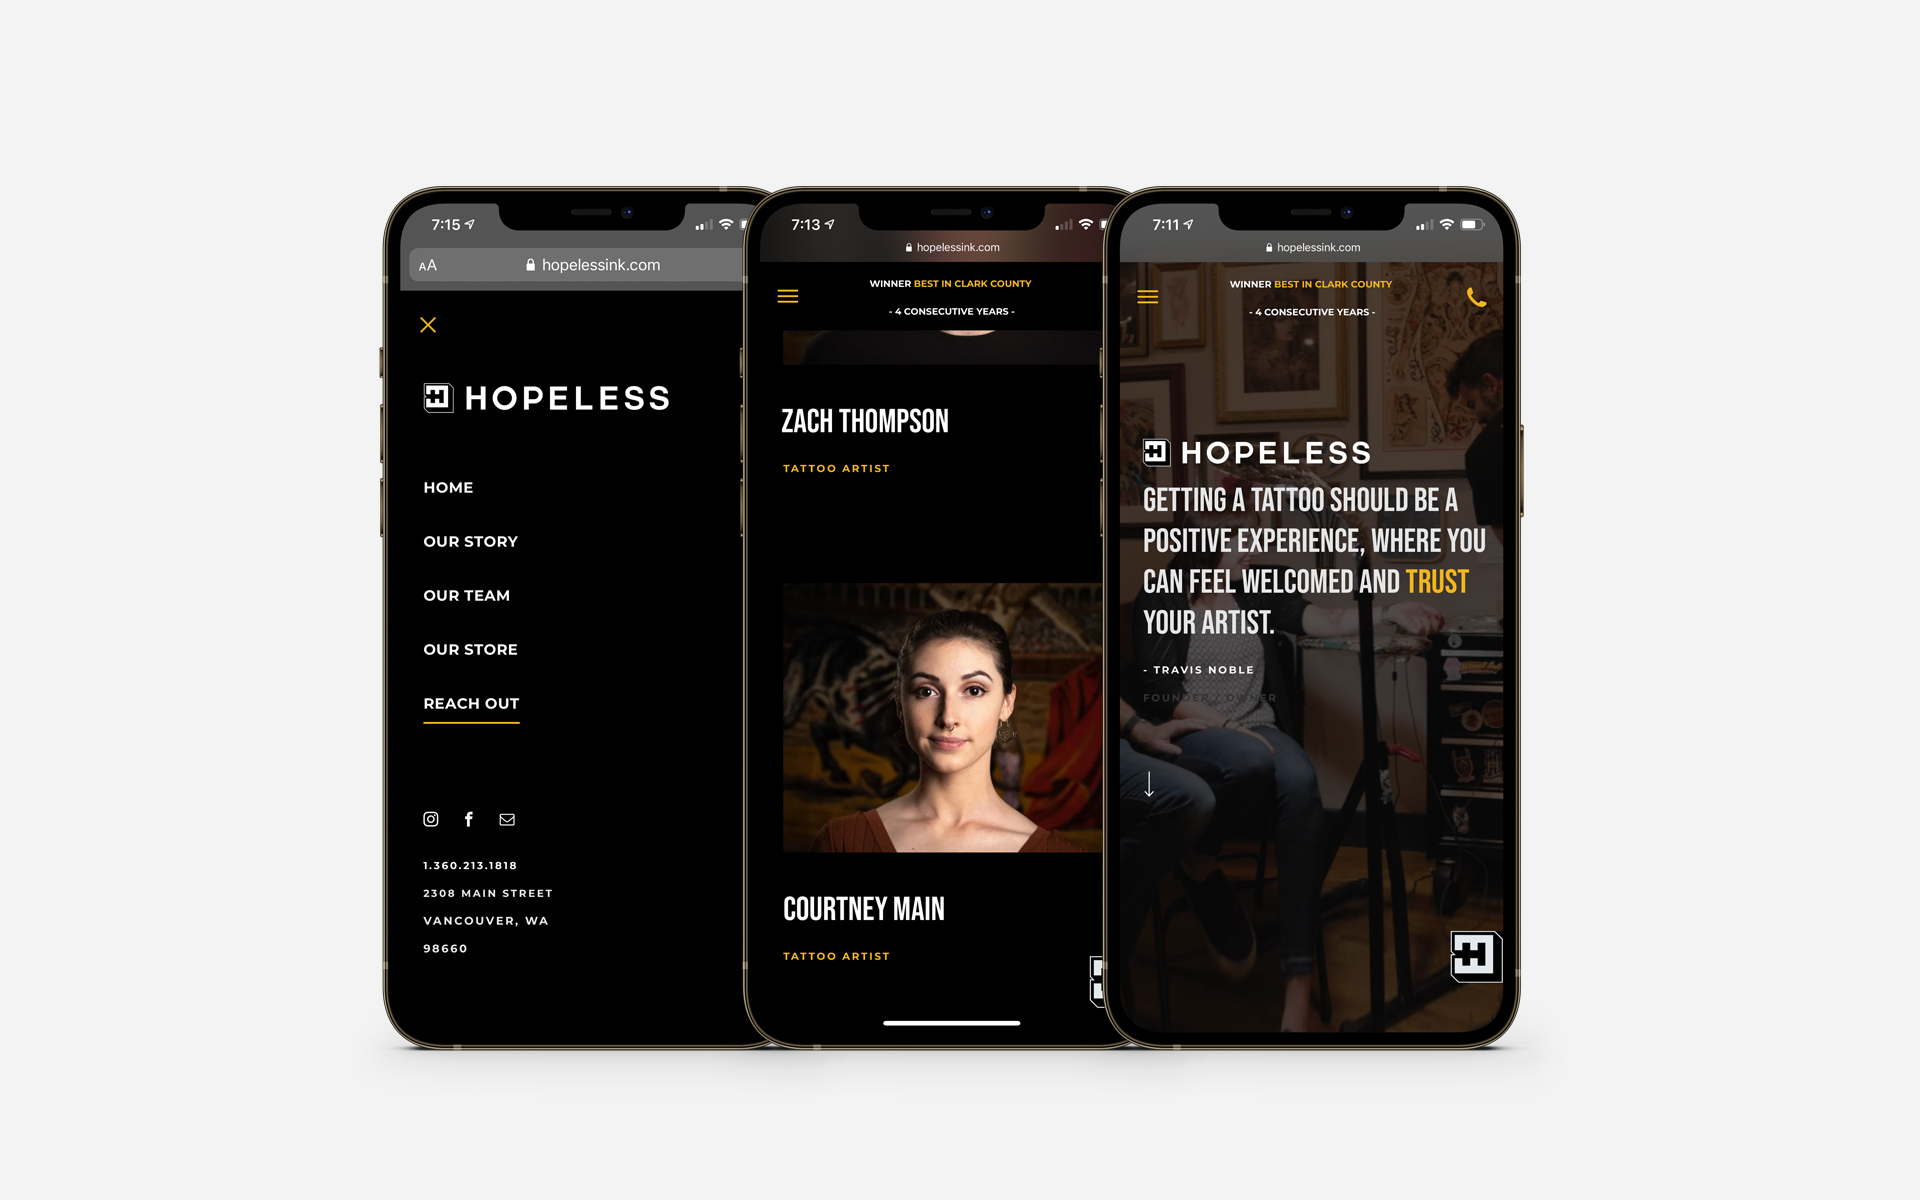 Hopeless phone mockup